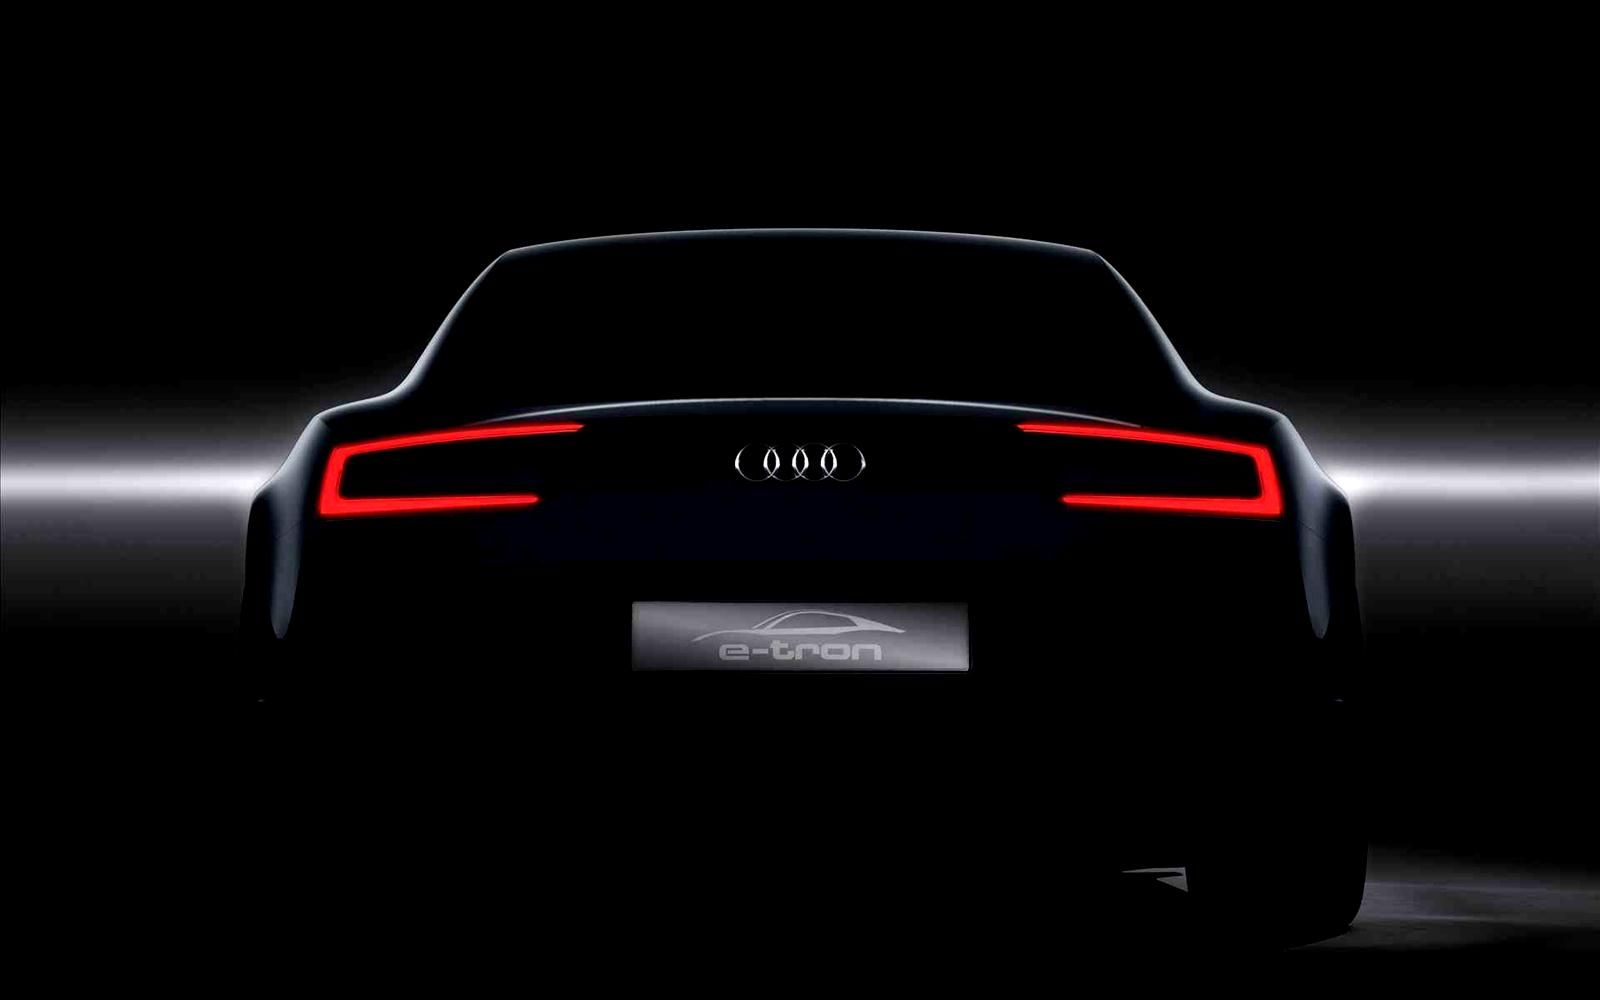 Audi E Tron 10 Audi Wallpaper Audi Wallpaper Black Audi